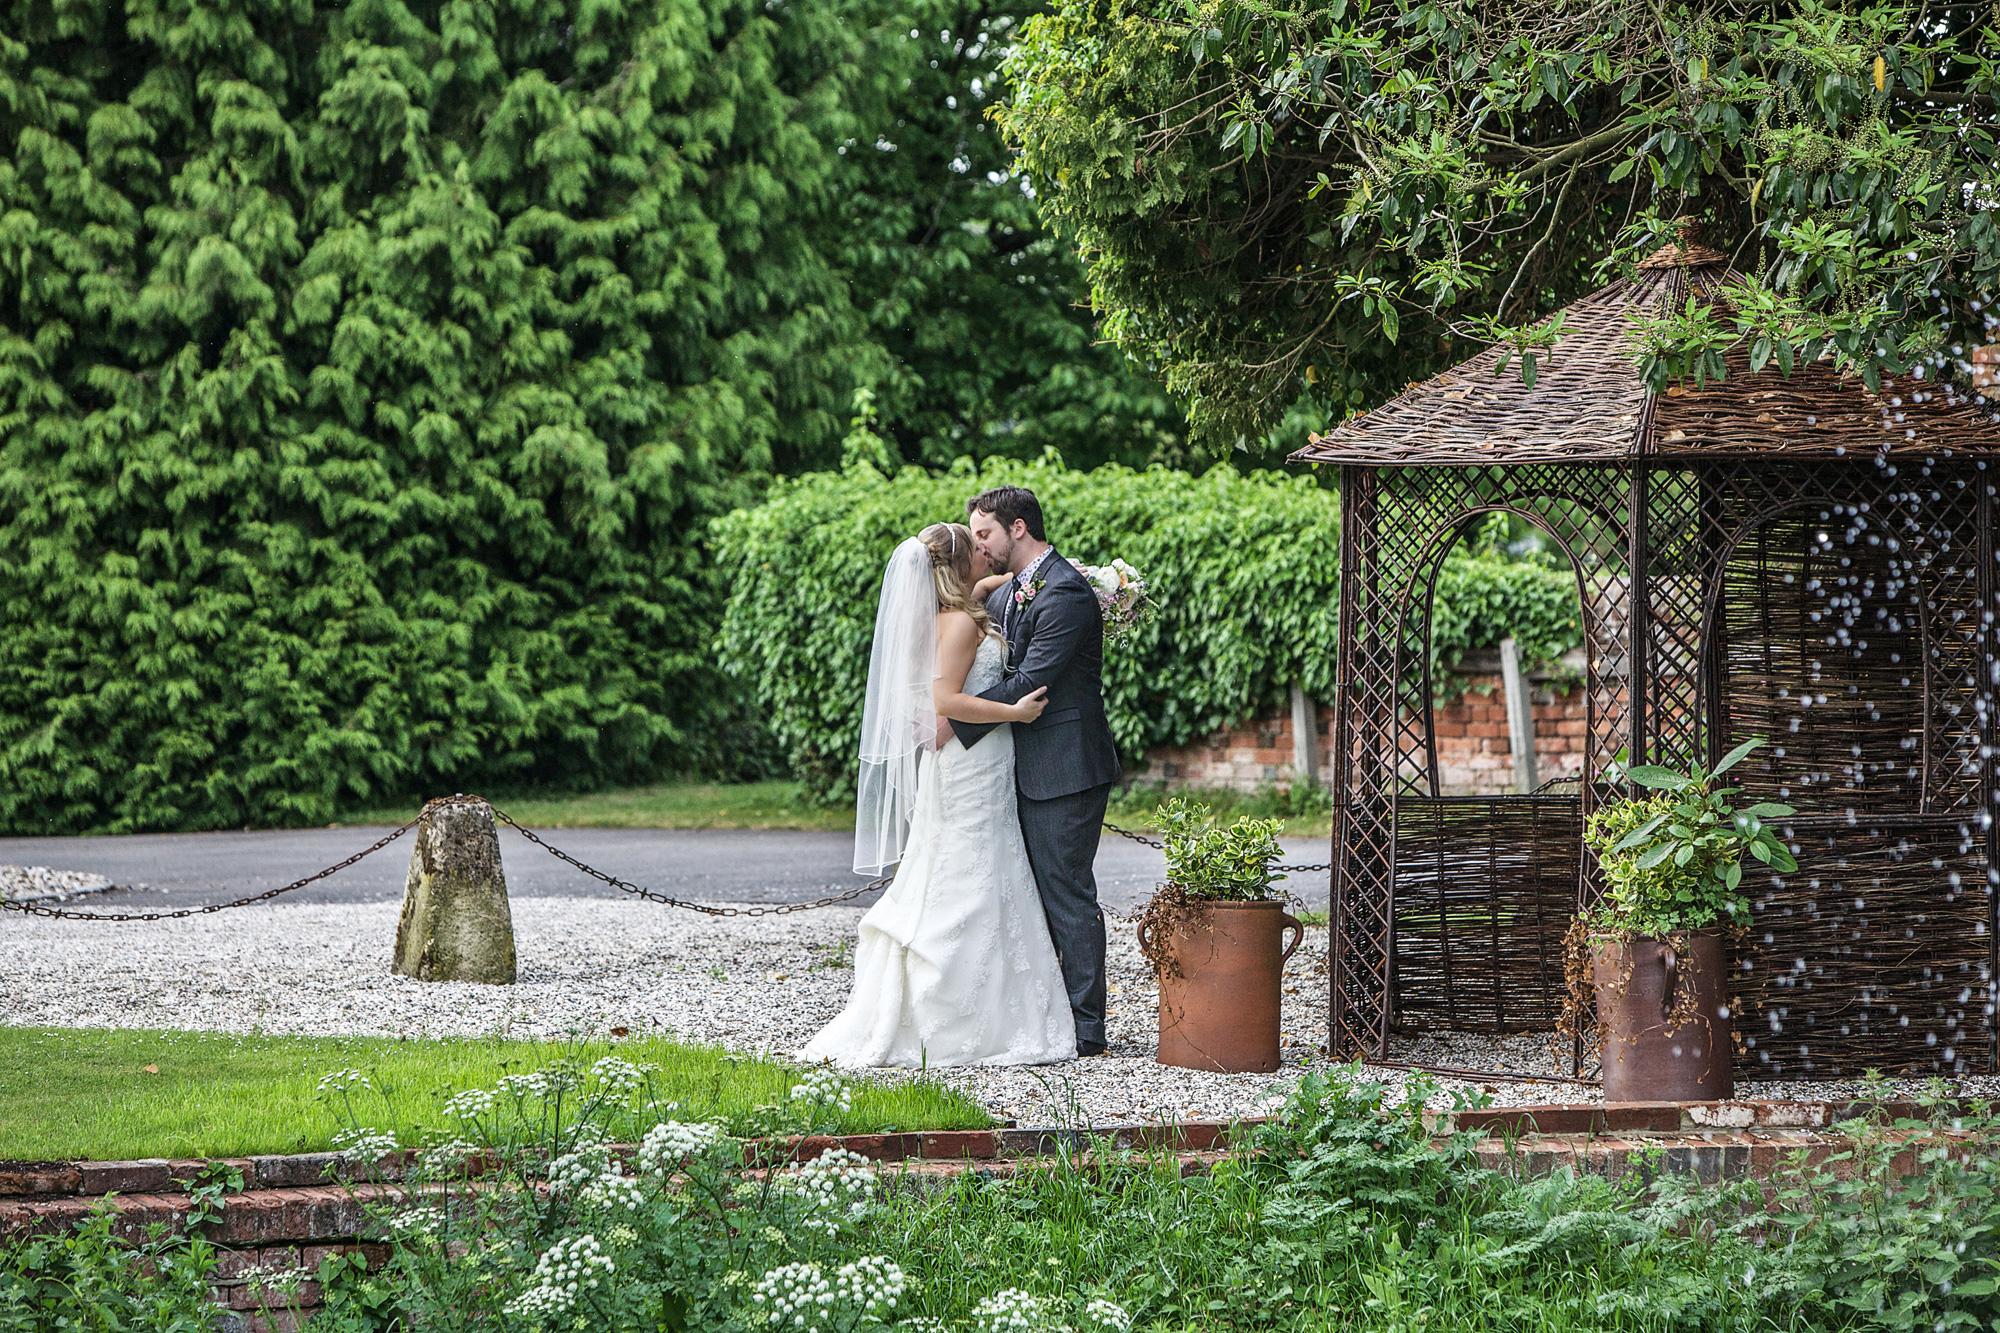 Adam_Hillier_Wedding_Photographer_Newbury_Berkshire_1 (11).jpg